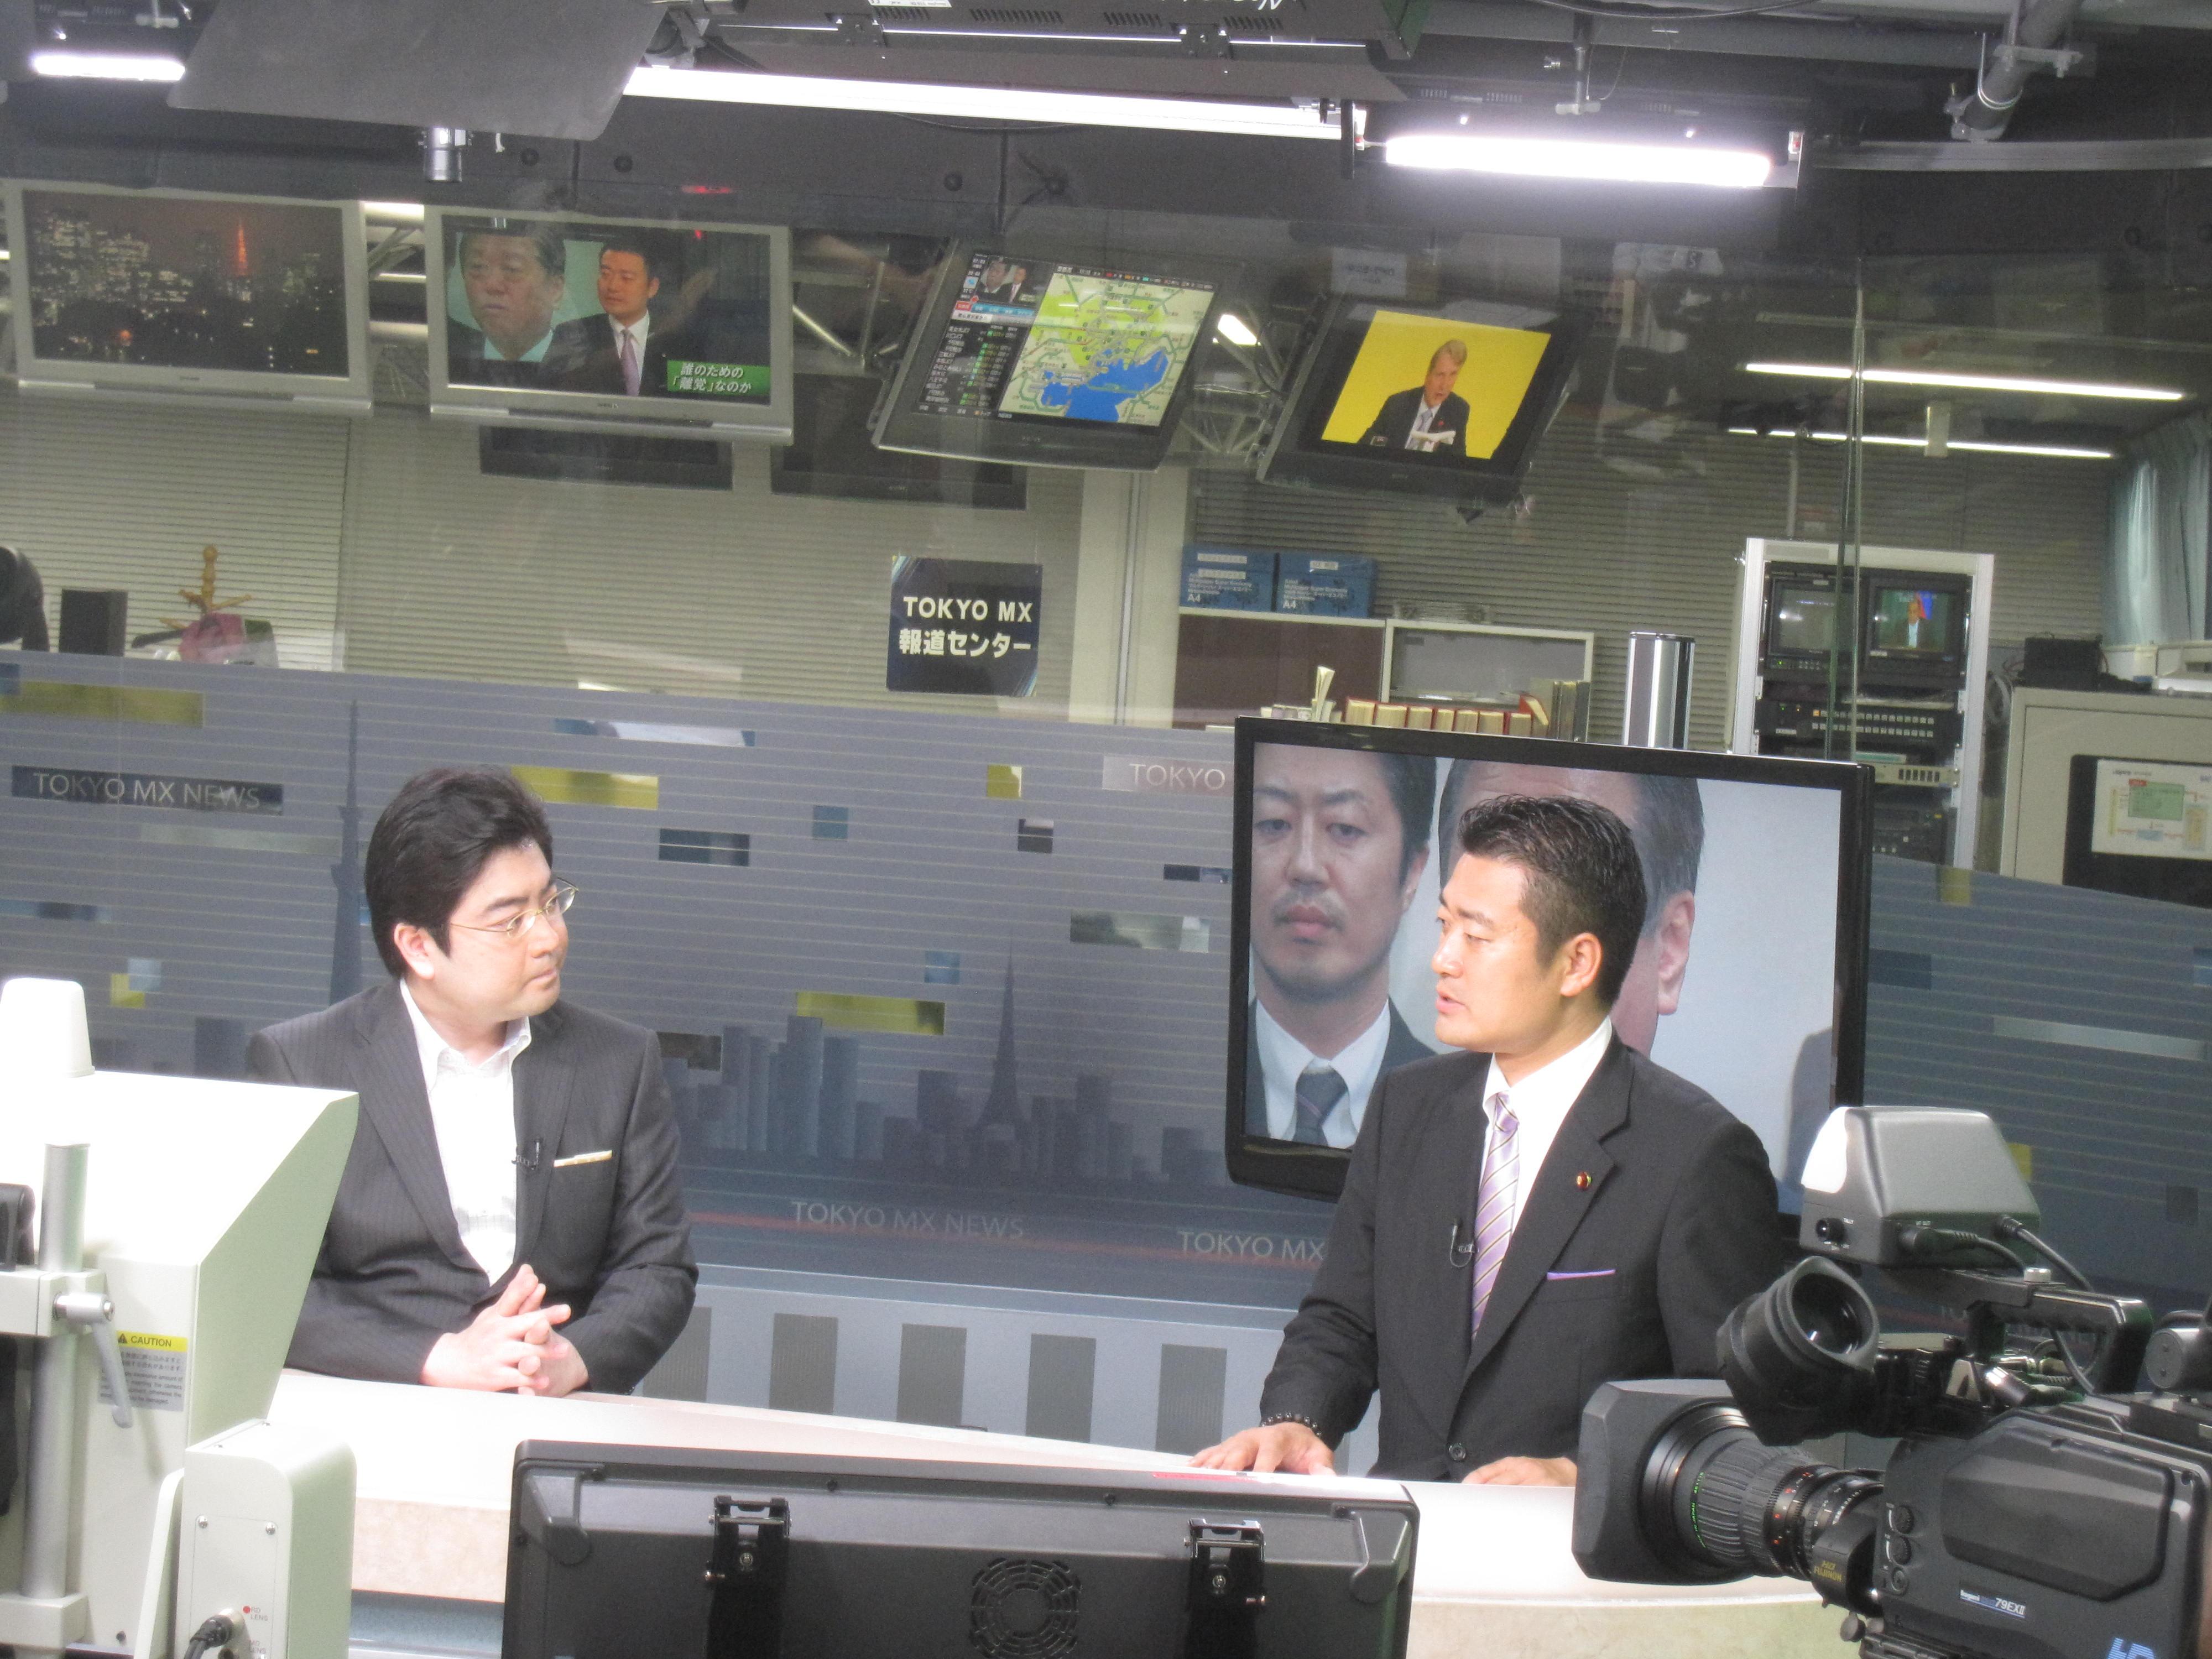 2012.7.3TOKYO MX 生出演 004.jpg